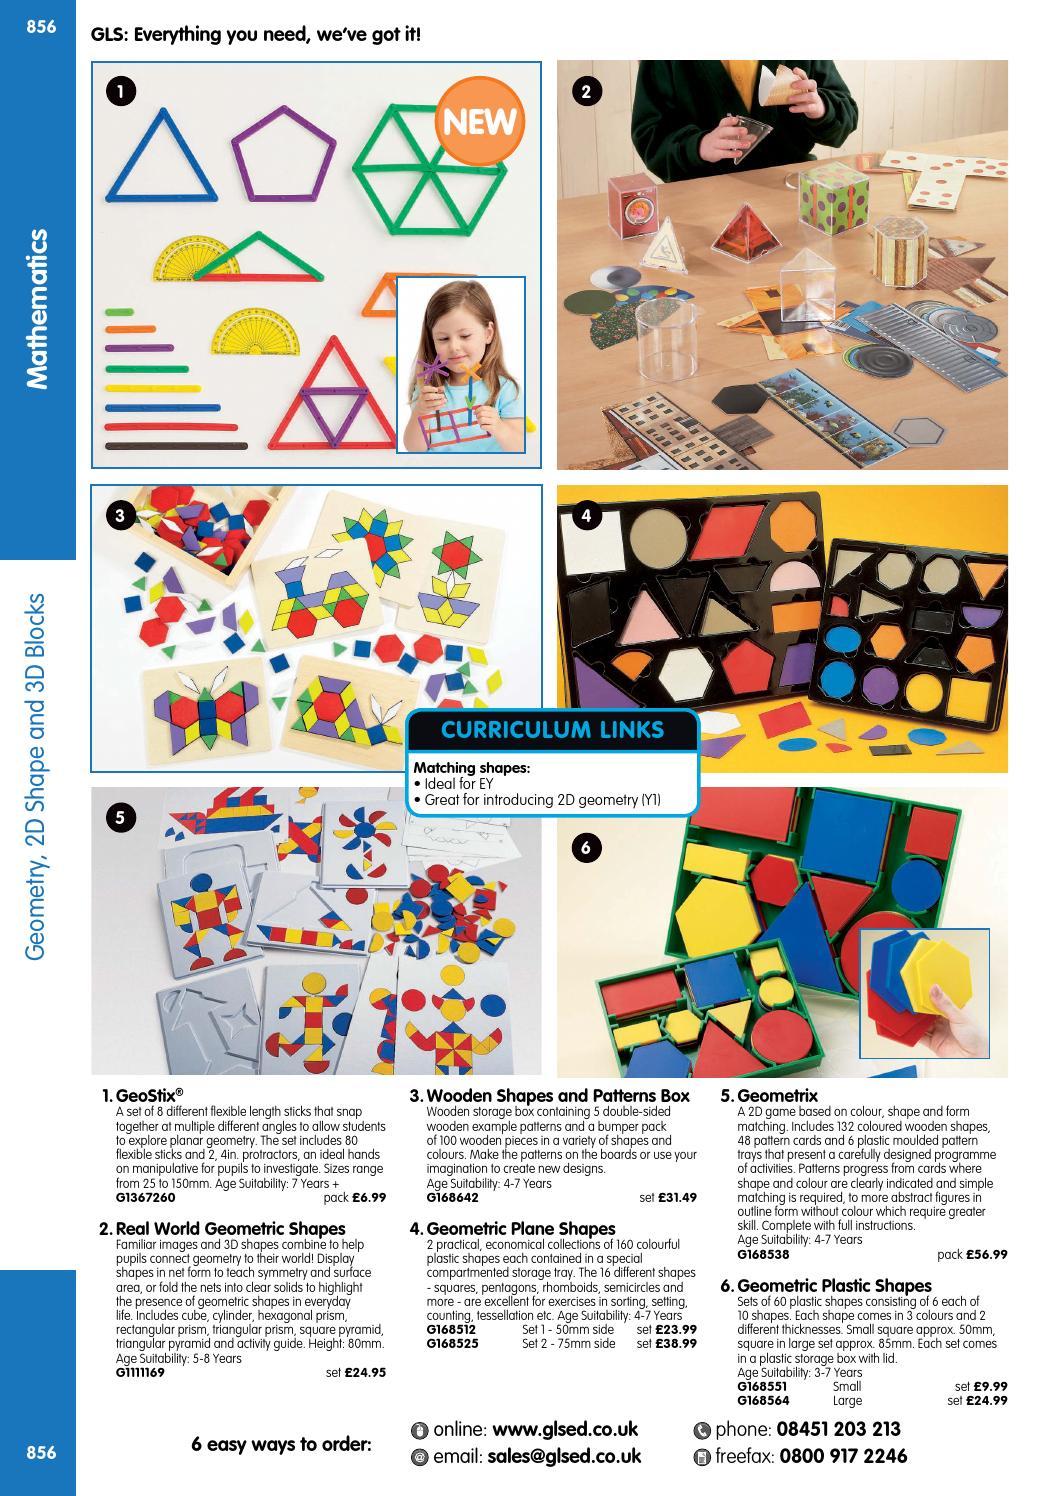 GLS Educational Supplies Catalogue 2015/16 - Mathematics by